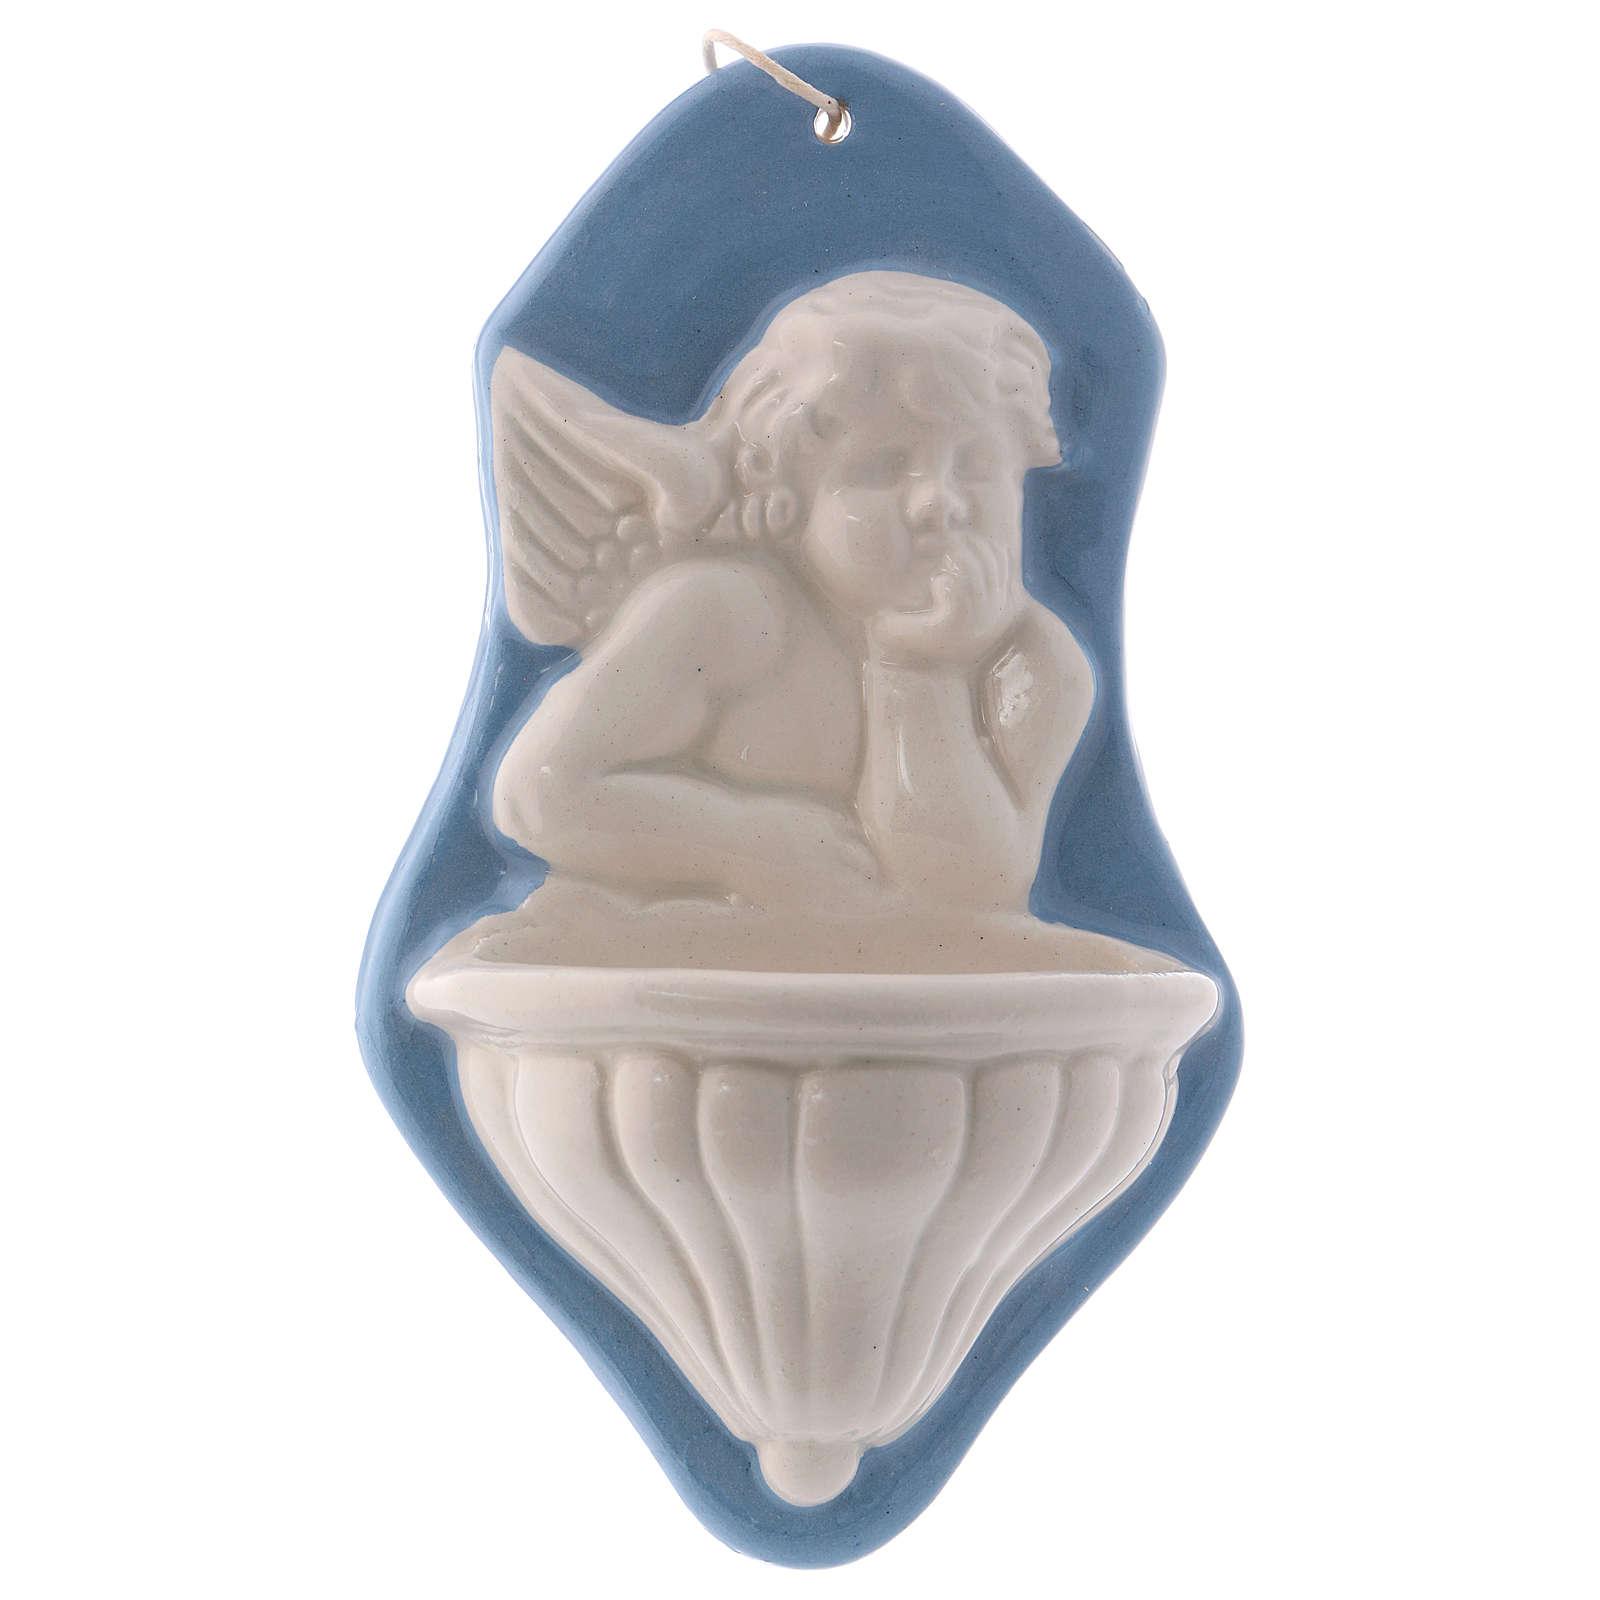 Pia água benta busto anjo fundo azul cerâmica Deruta 15x10x5 cm 4